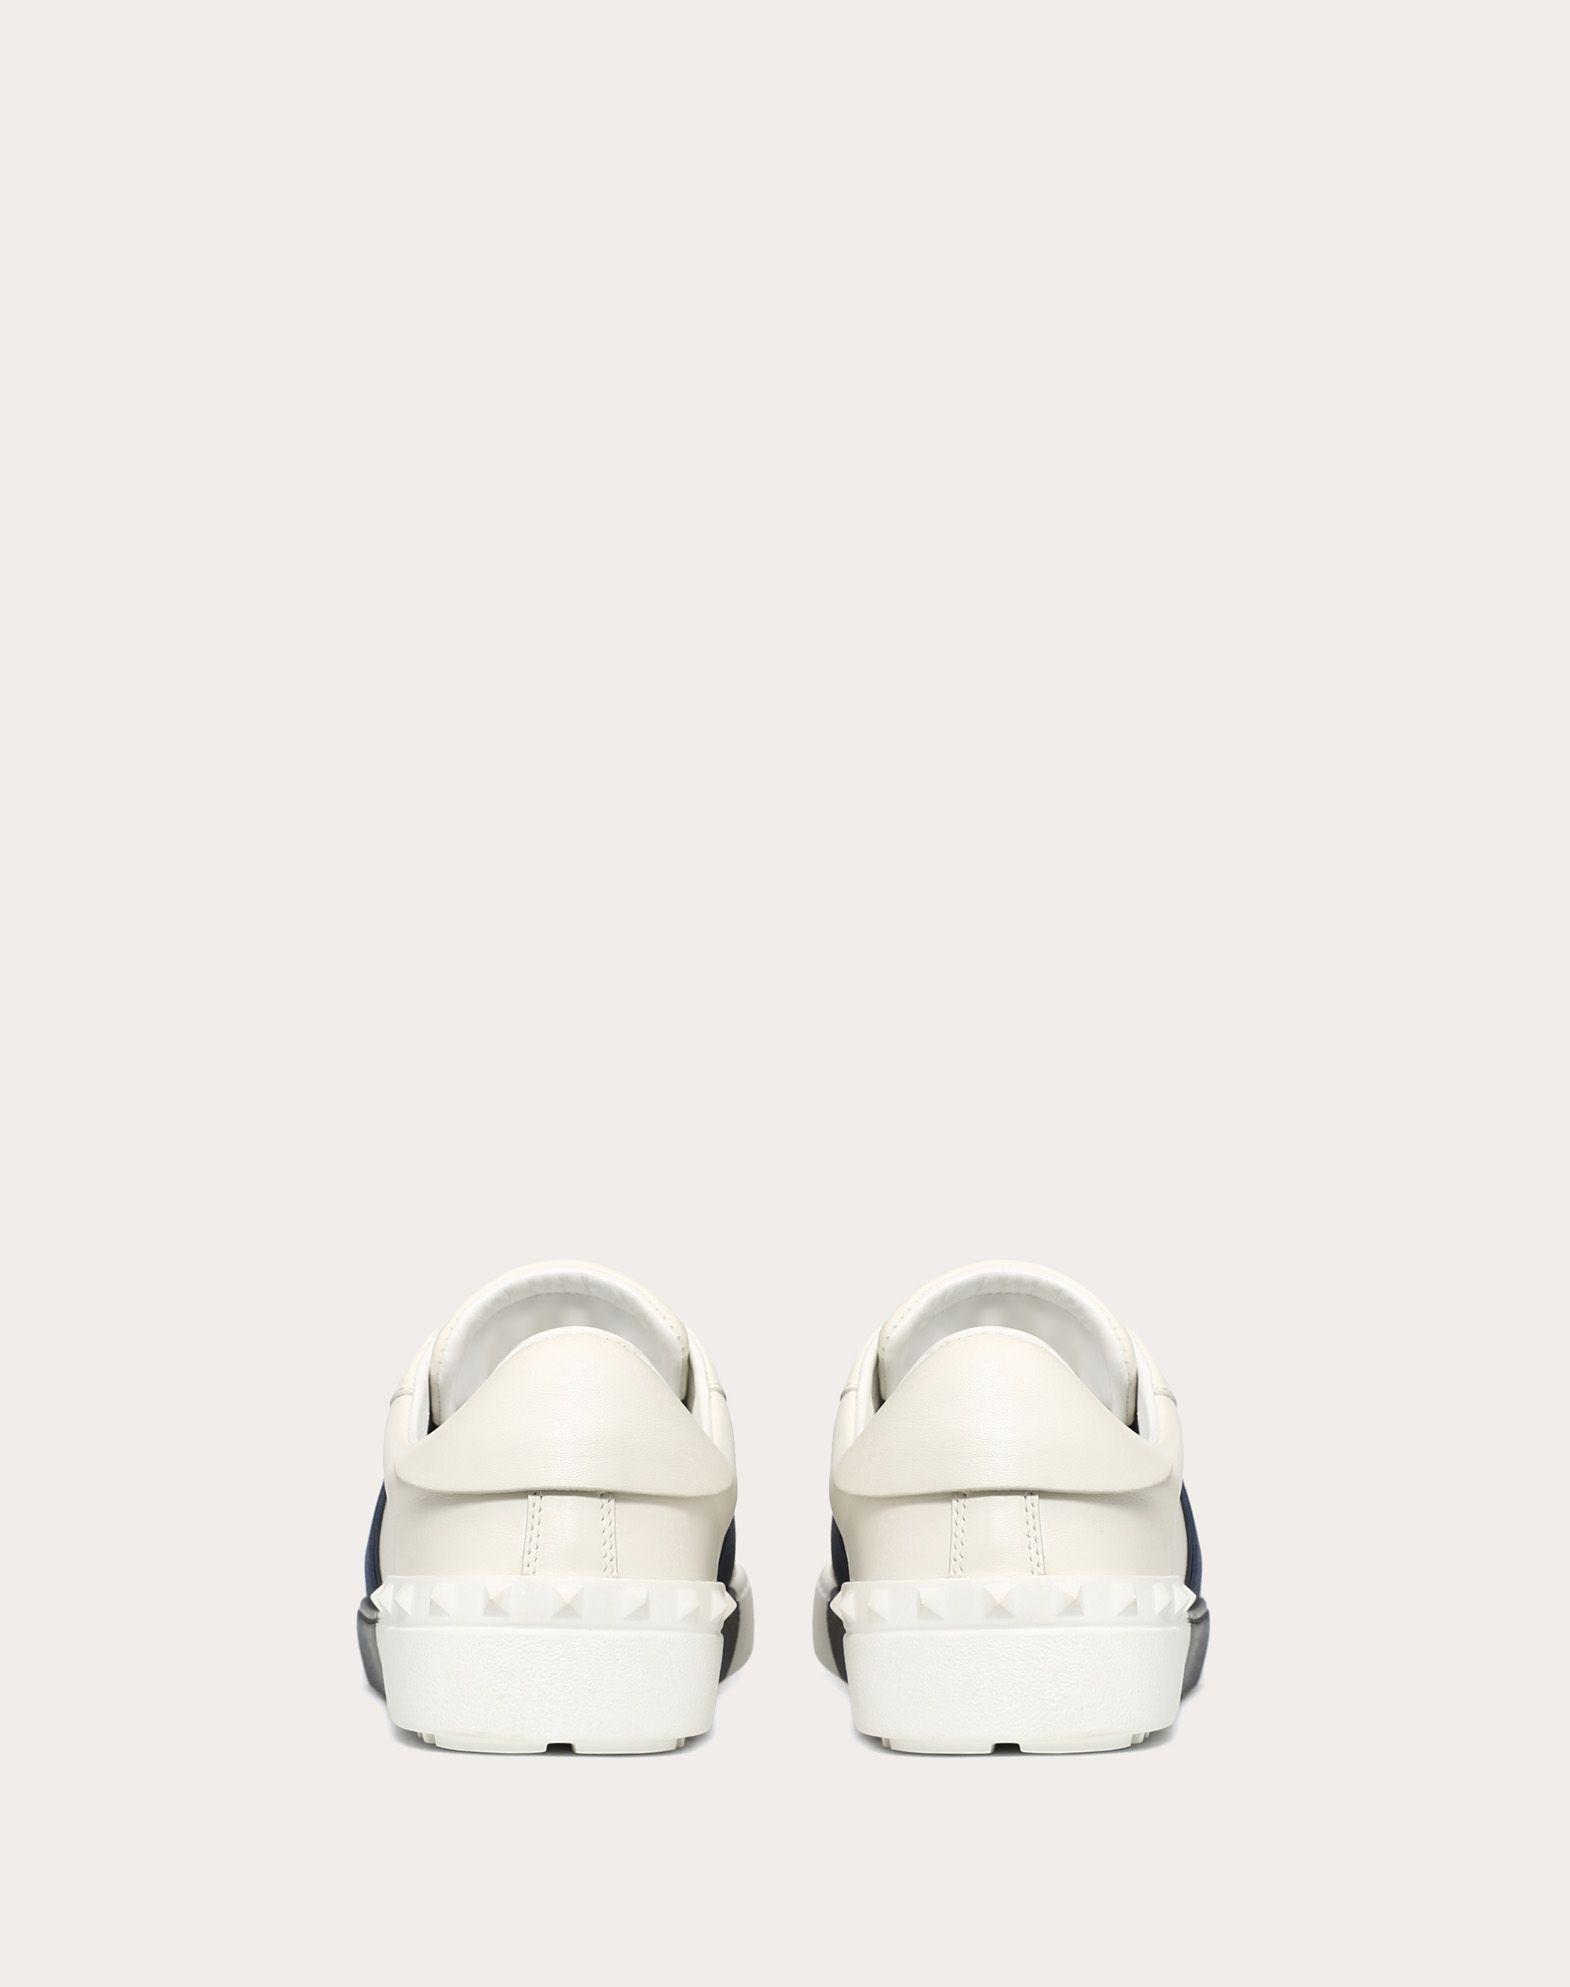 VALENTINO GARAVANI UOMO Elastic Sneaker LOW-TOP SNEAKERS U d